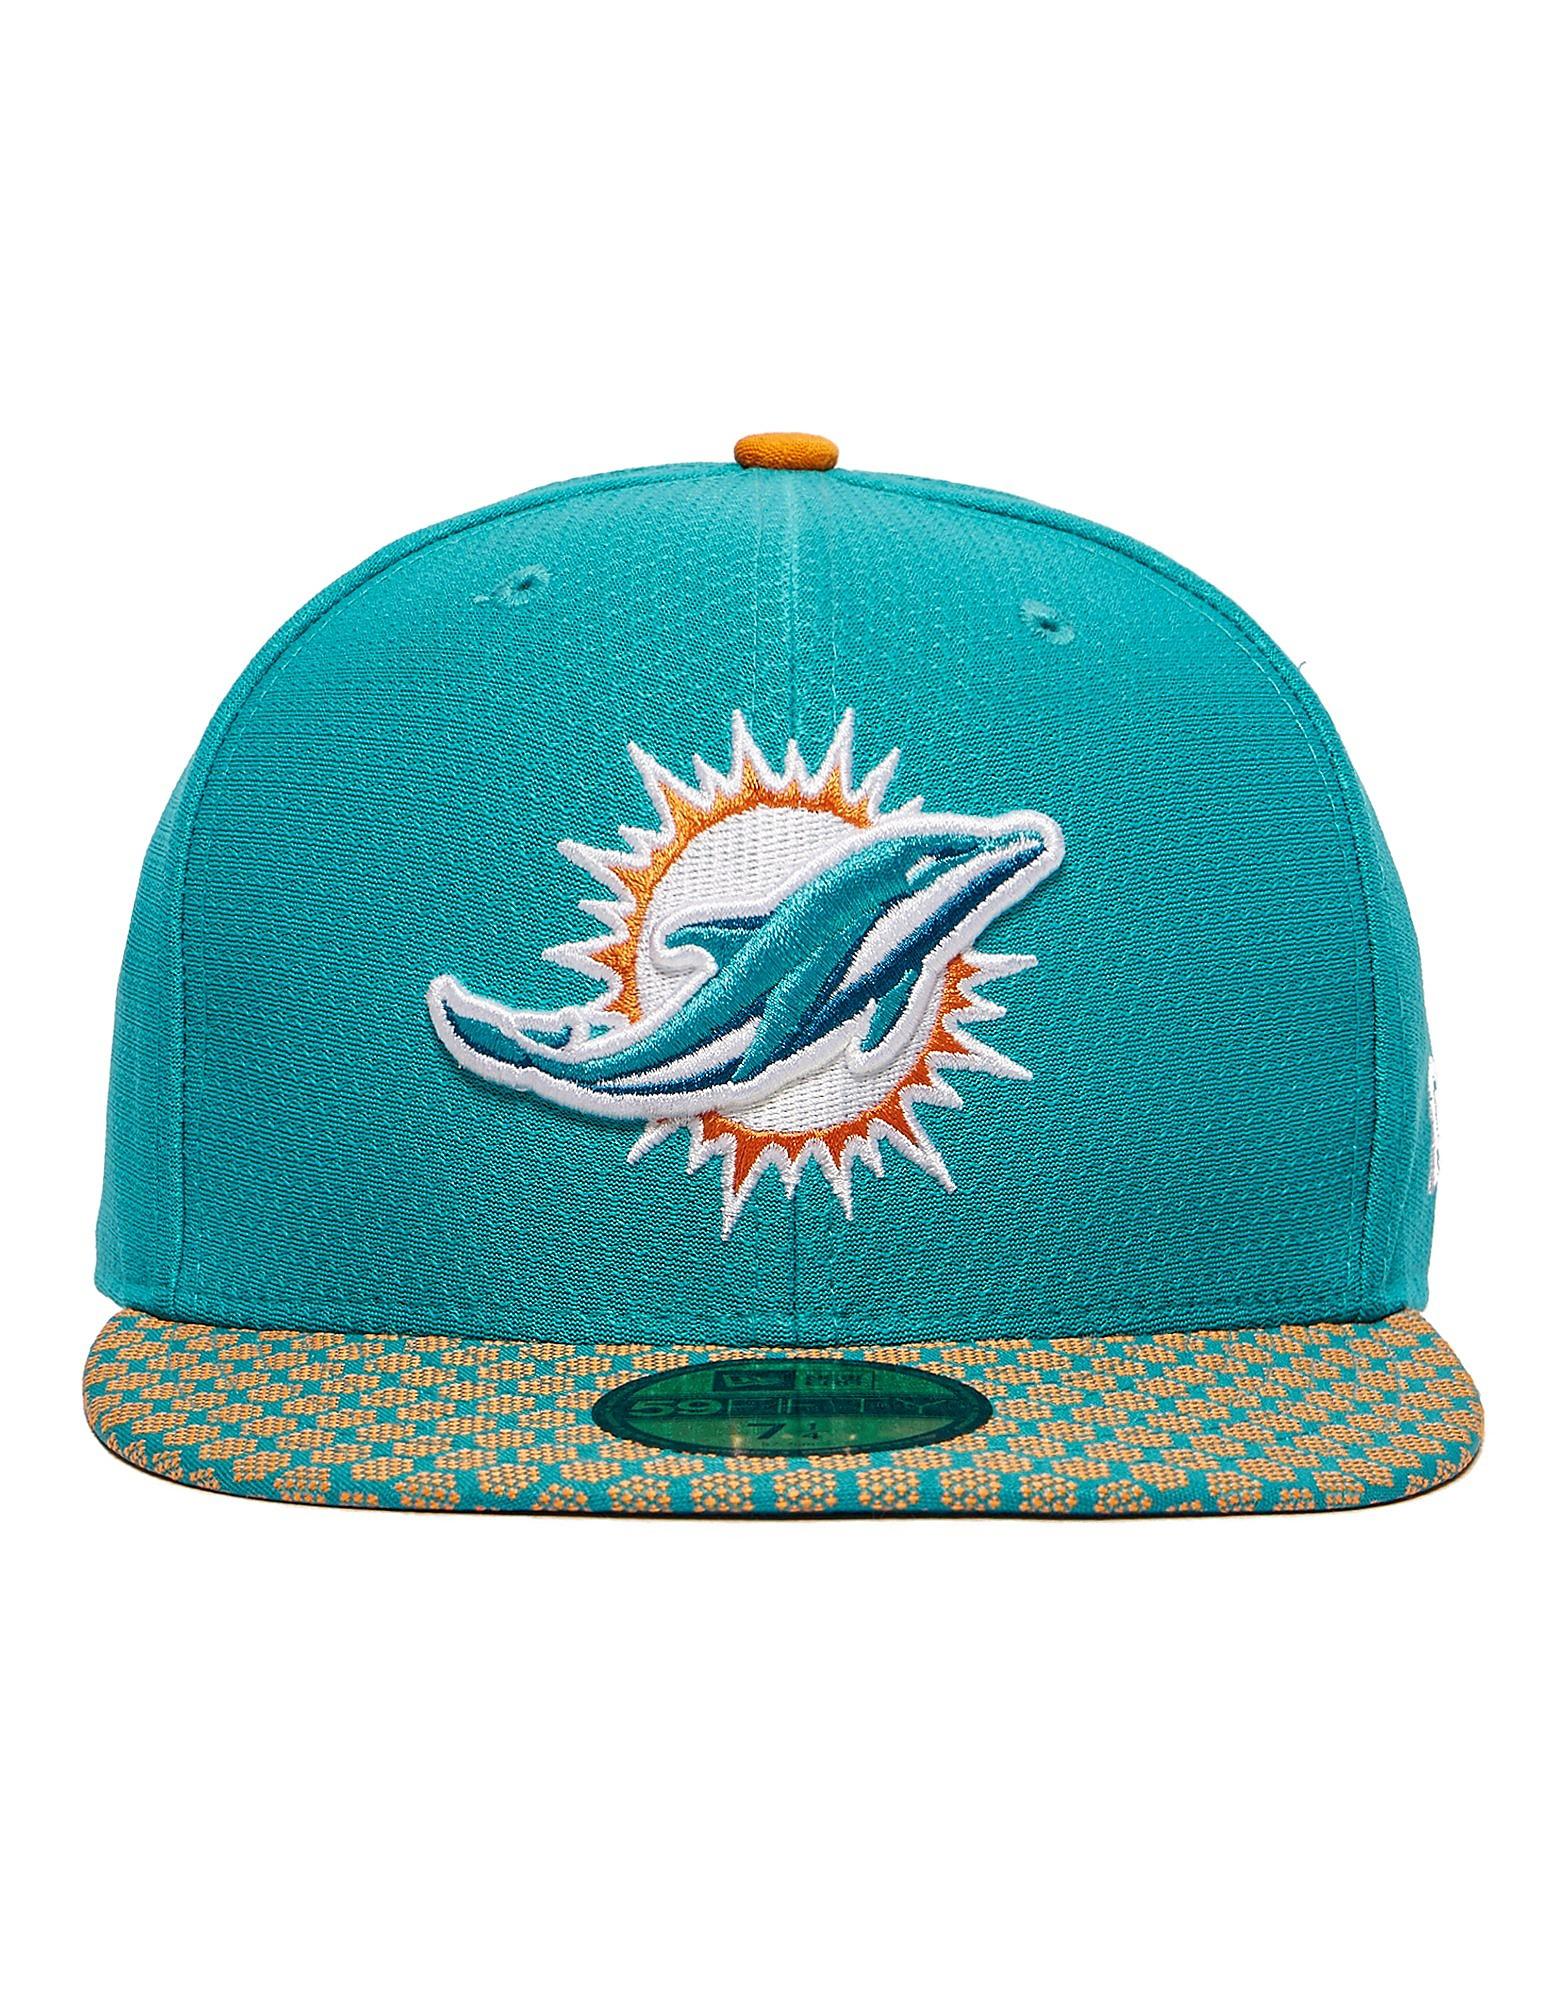 New Era NFL Miami Dolphins 59FIFTY Cap